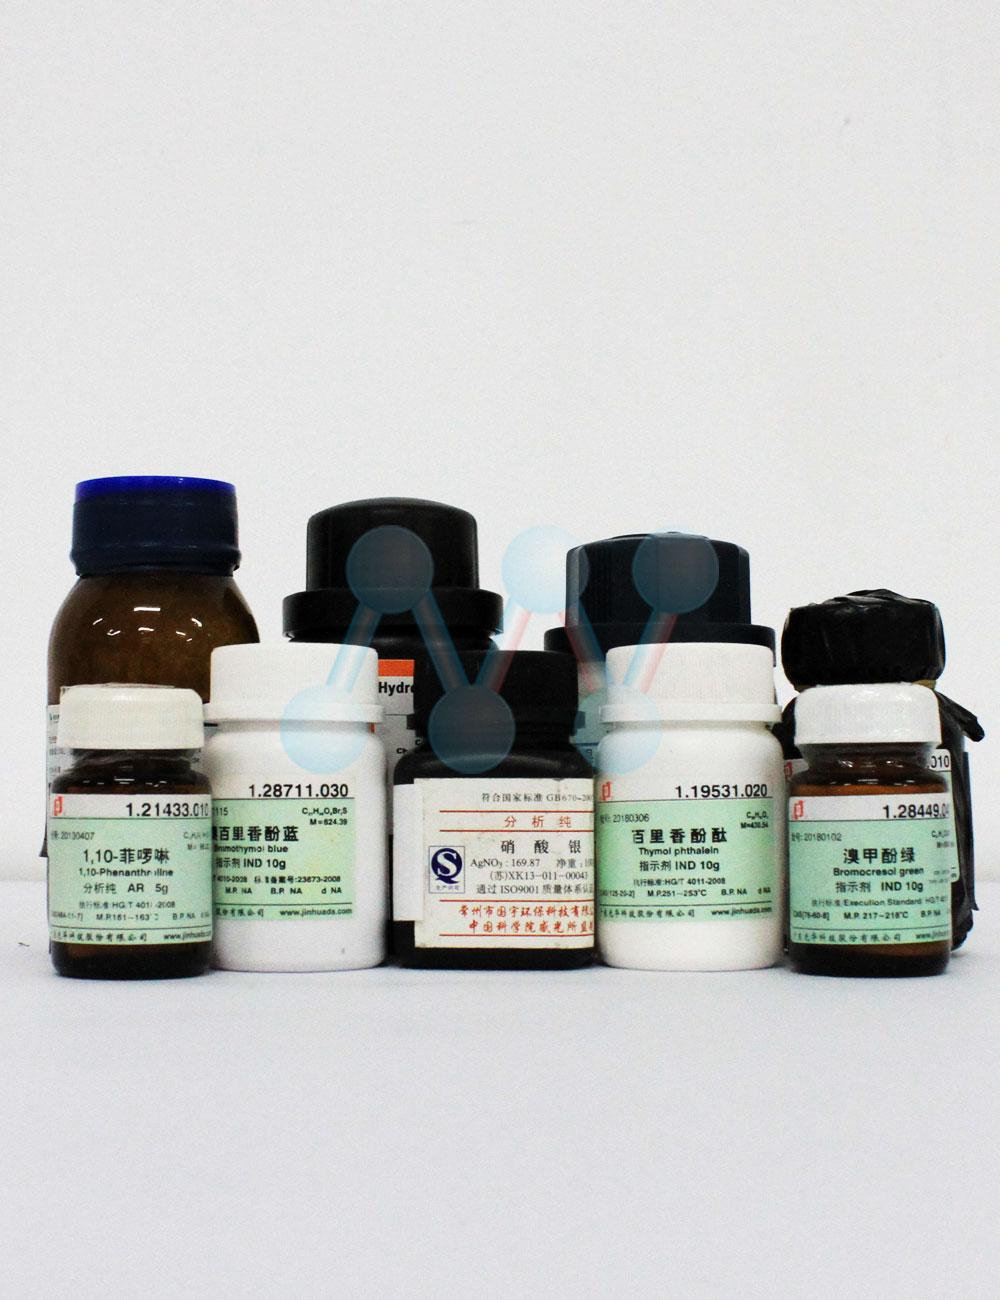 Bromophenol blue C19H10Br4O5S